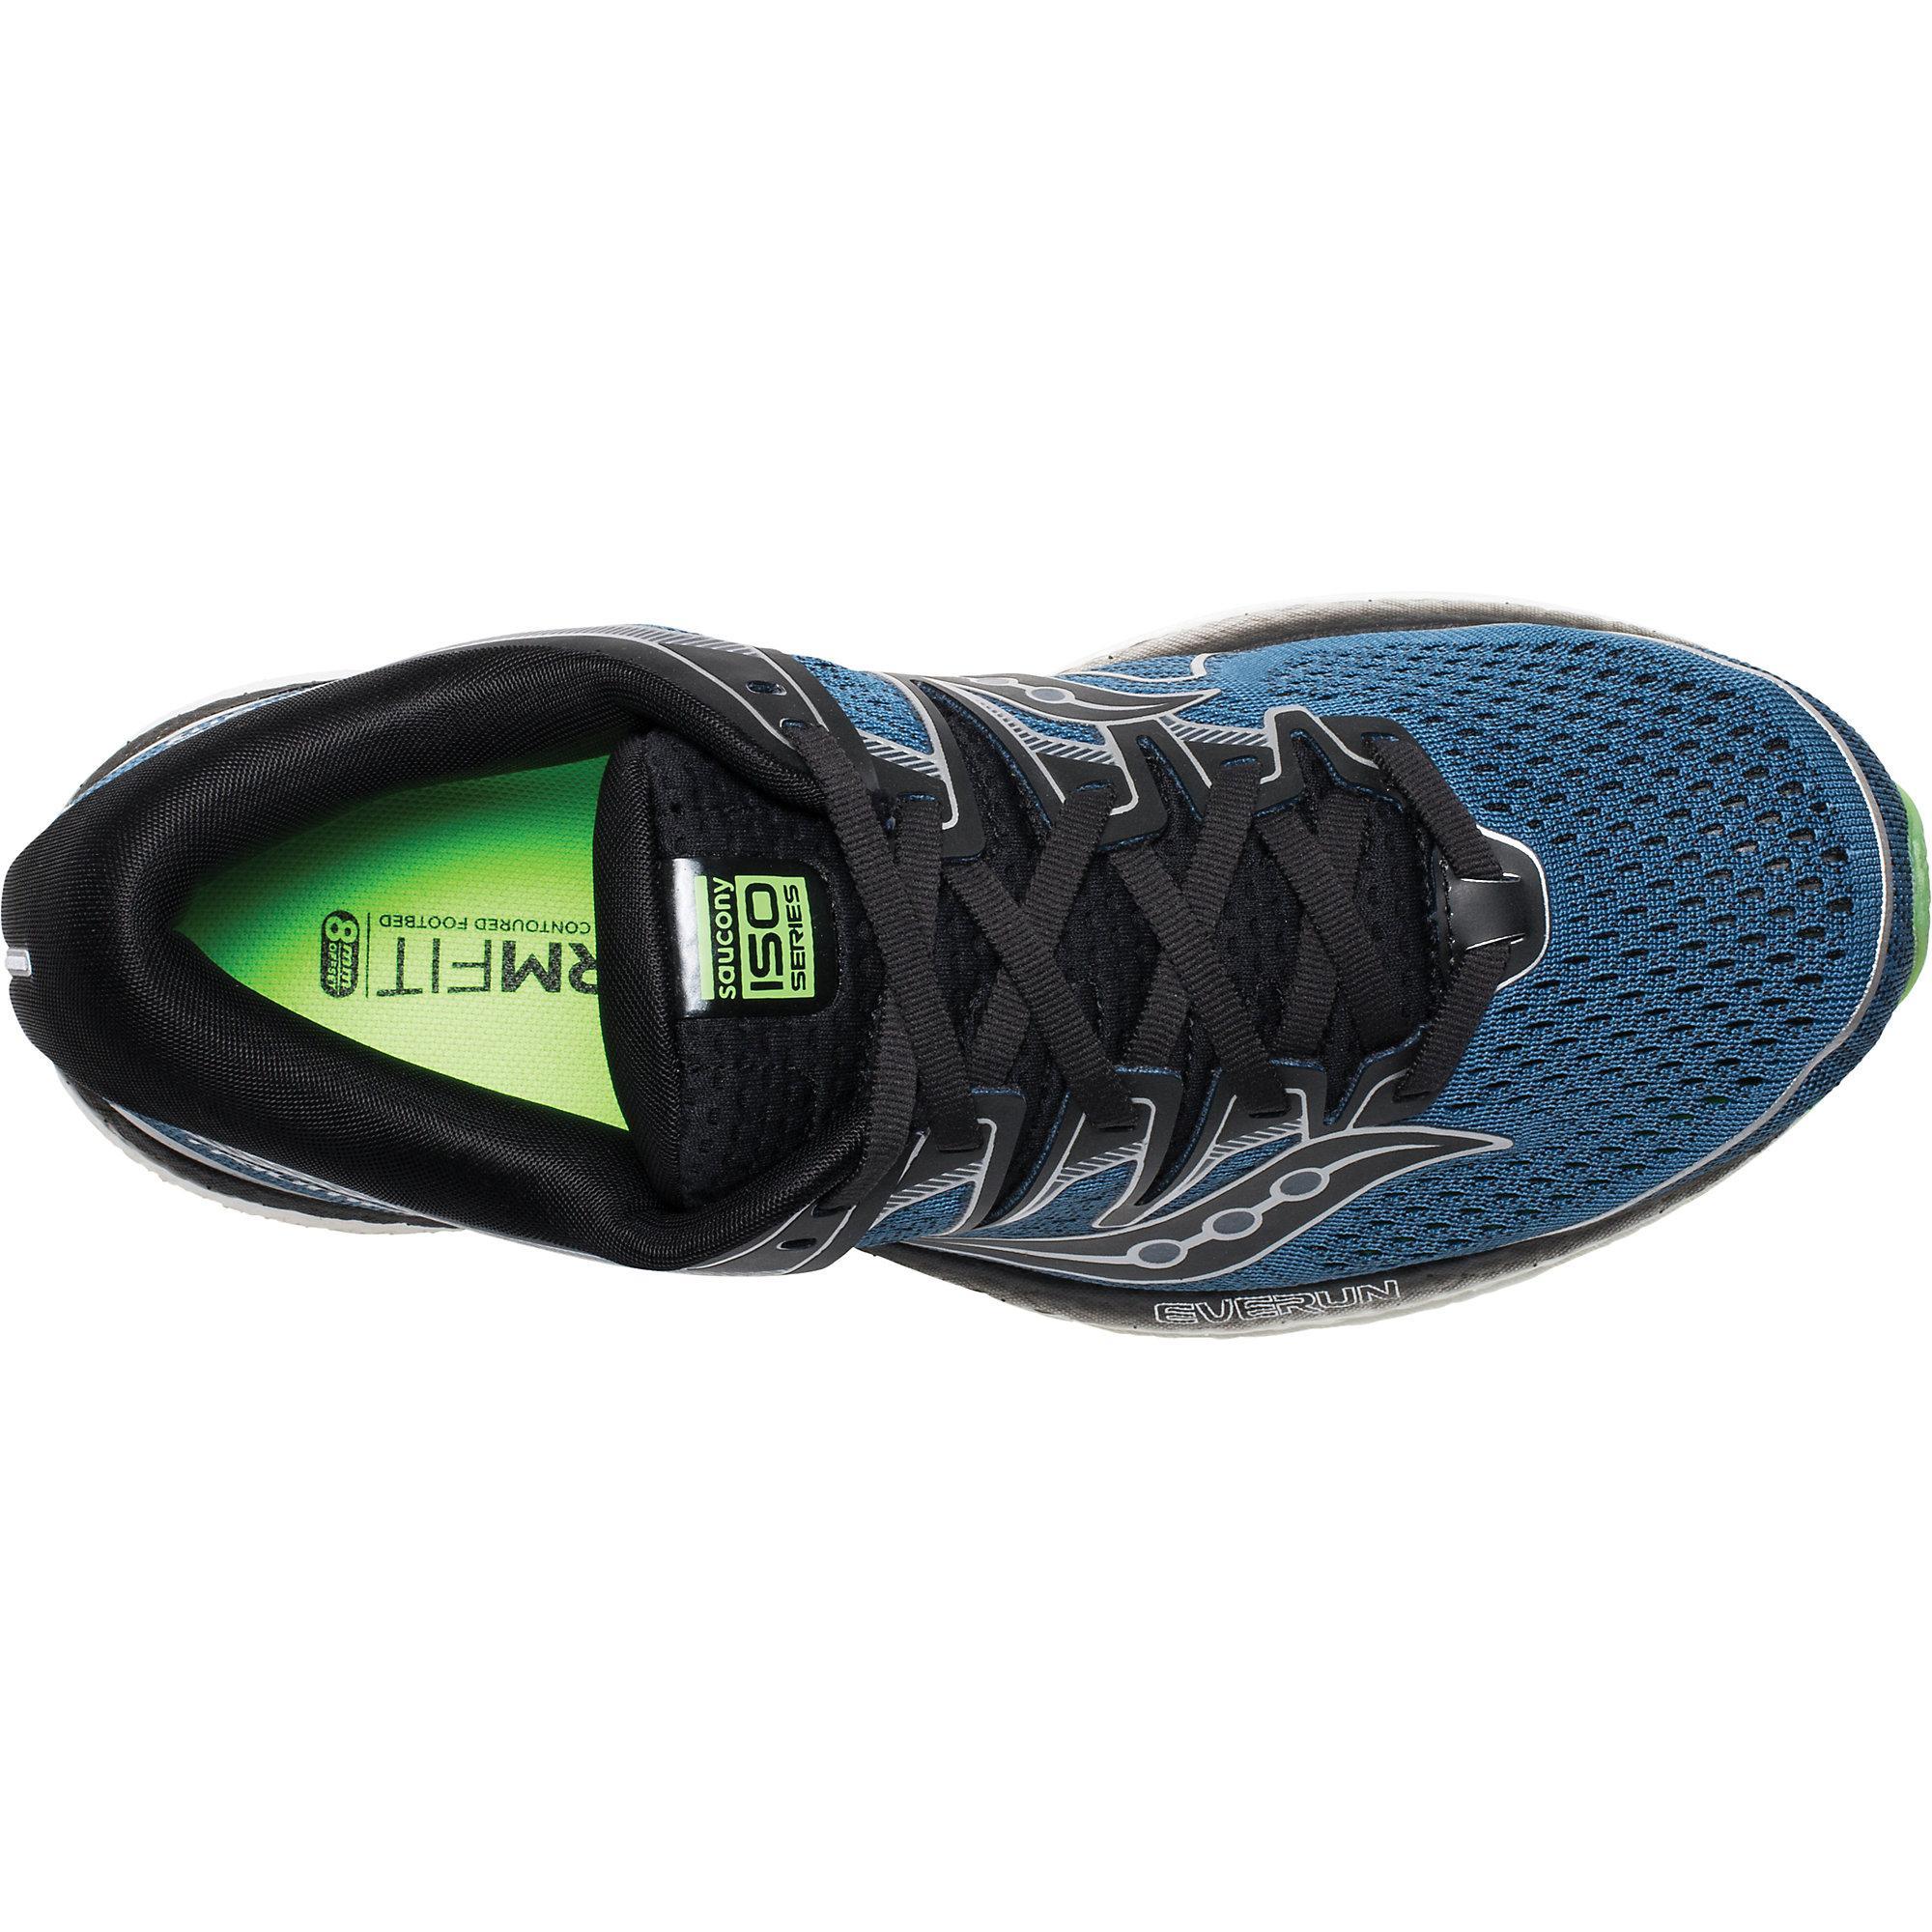 1f03da0b Saucony Triumph Iso 5 Shoe for Men - Save 1% - Lyst